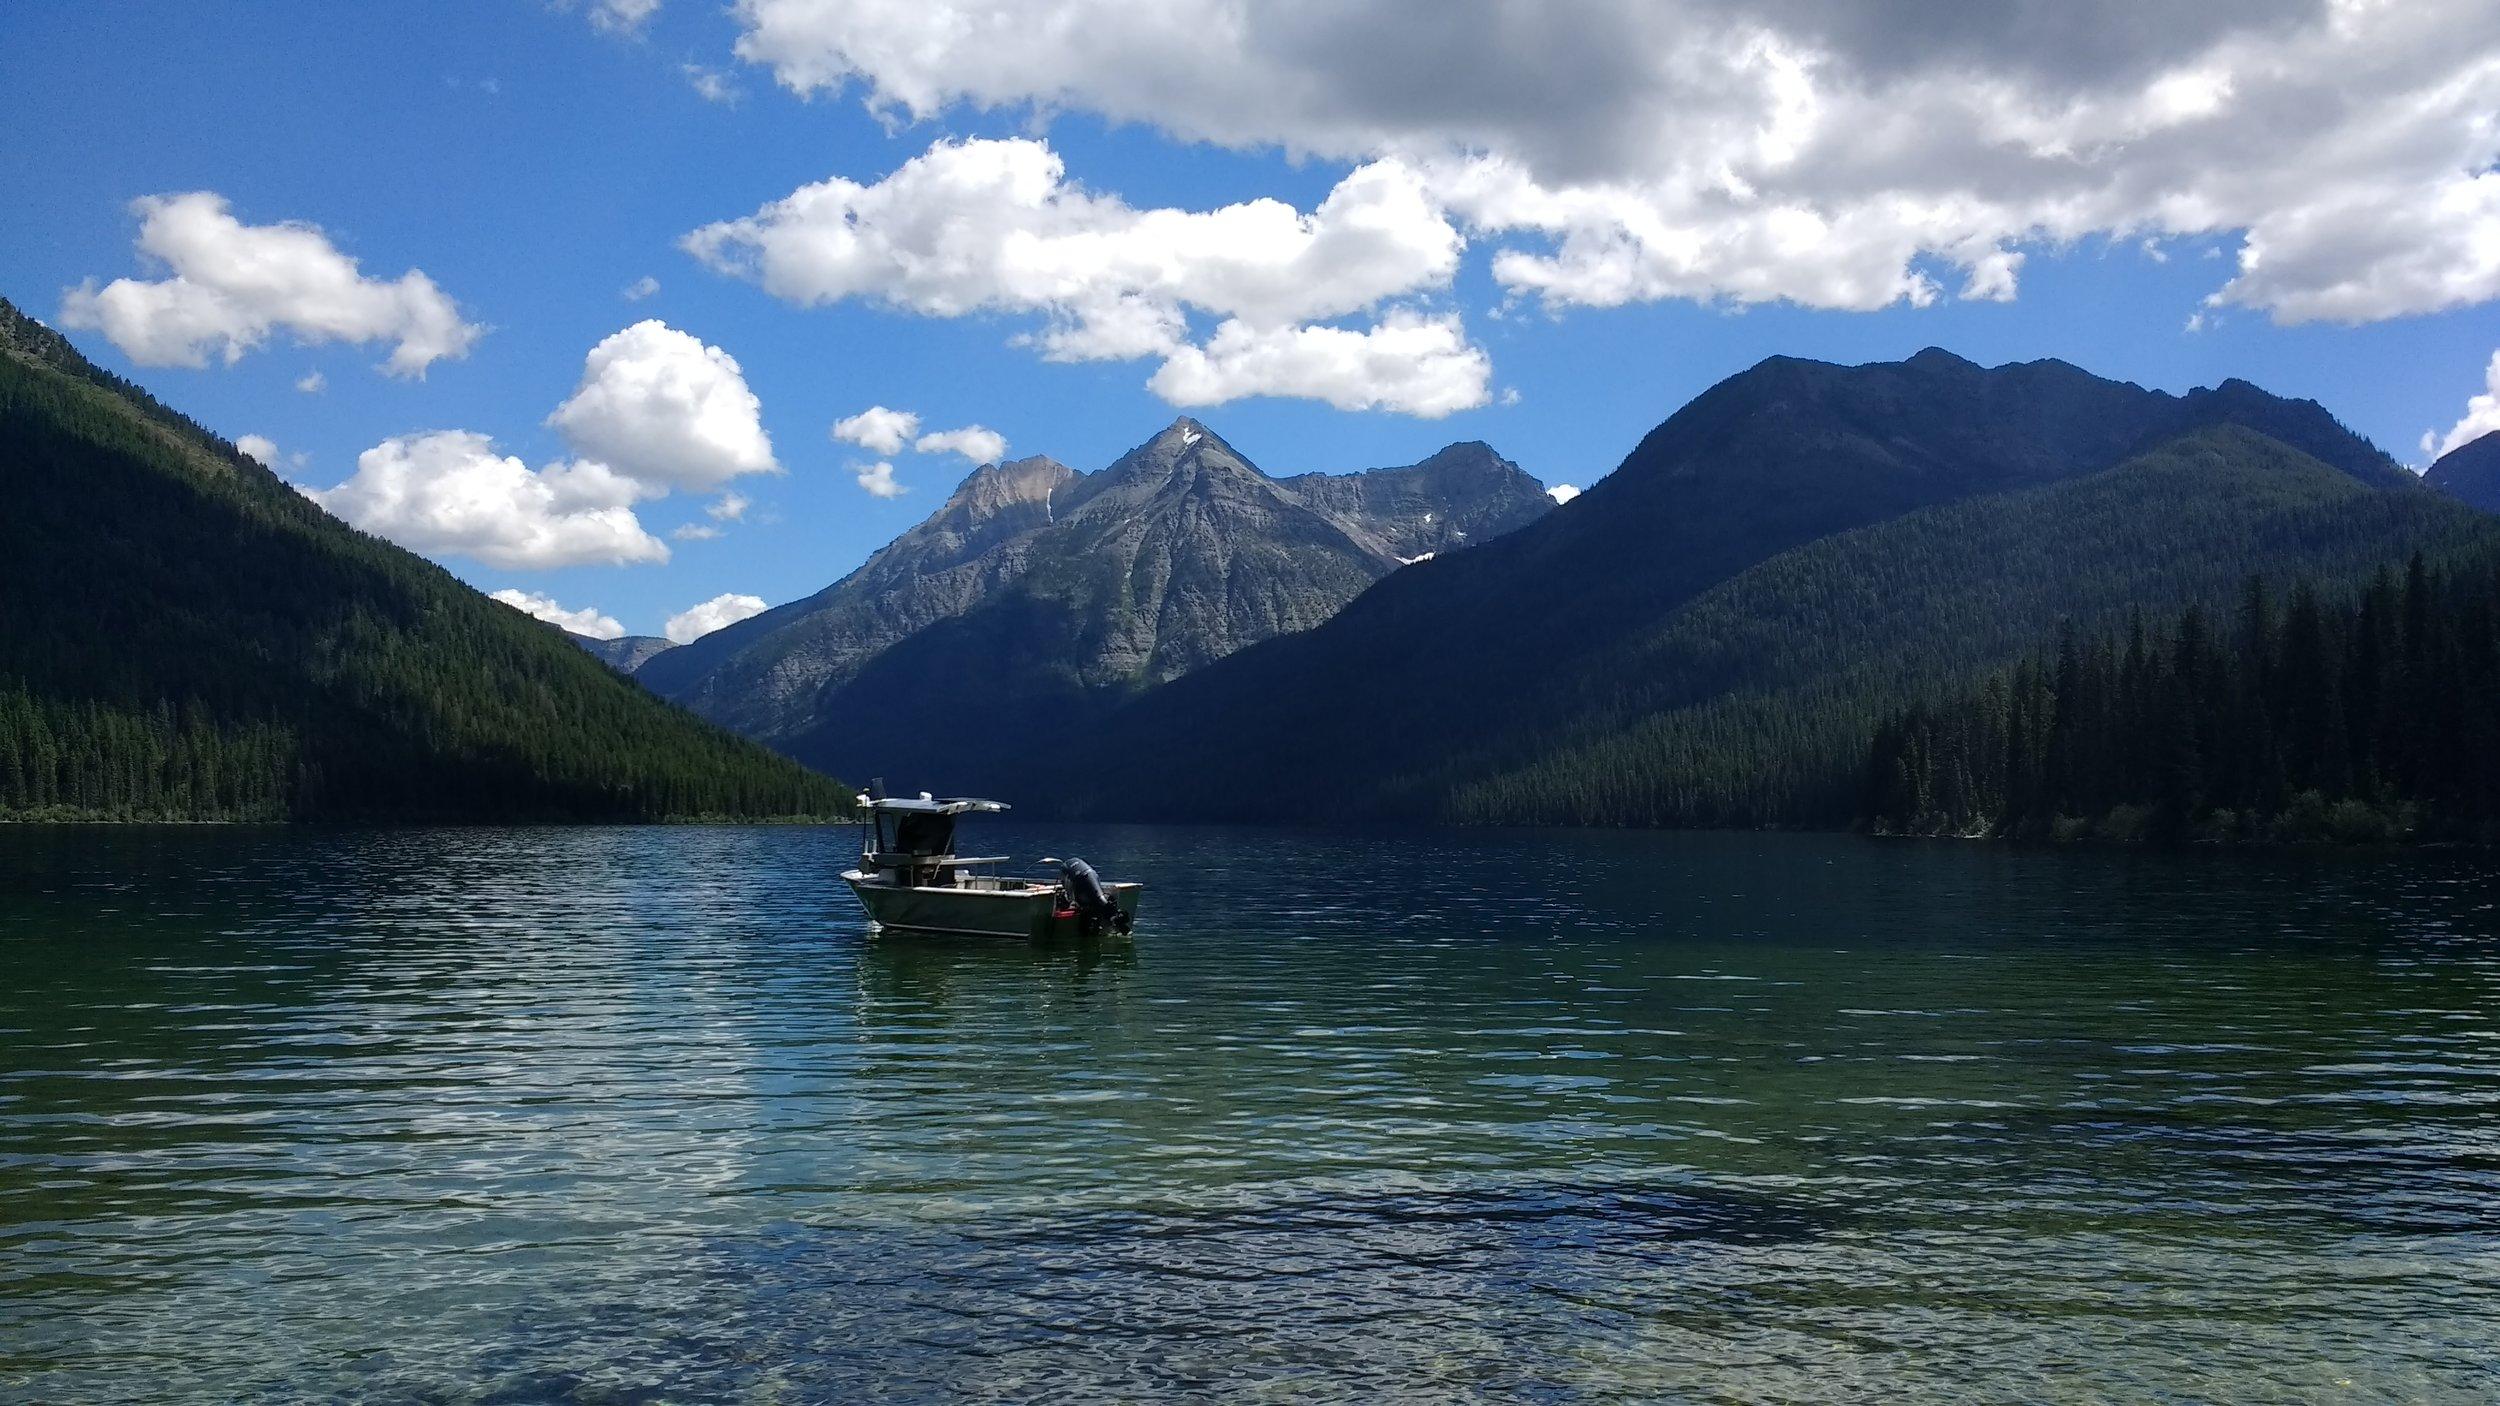 Quartz Lake, Glacier National Park // photo by Tom Sentner